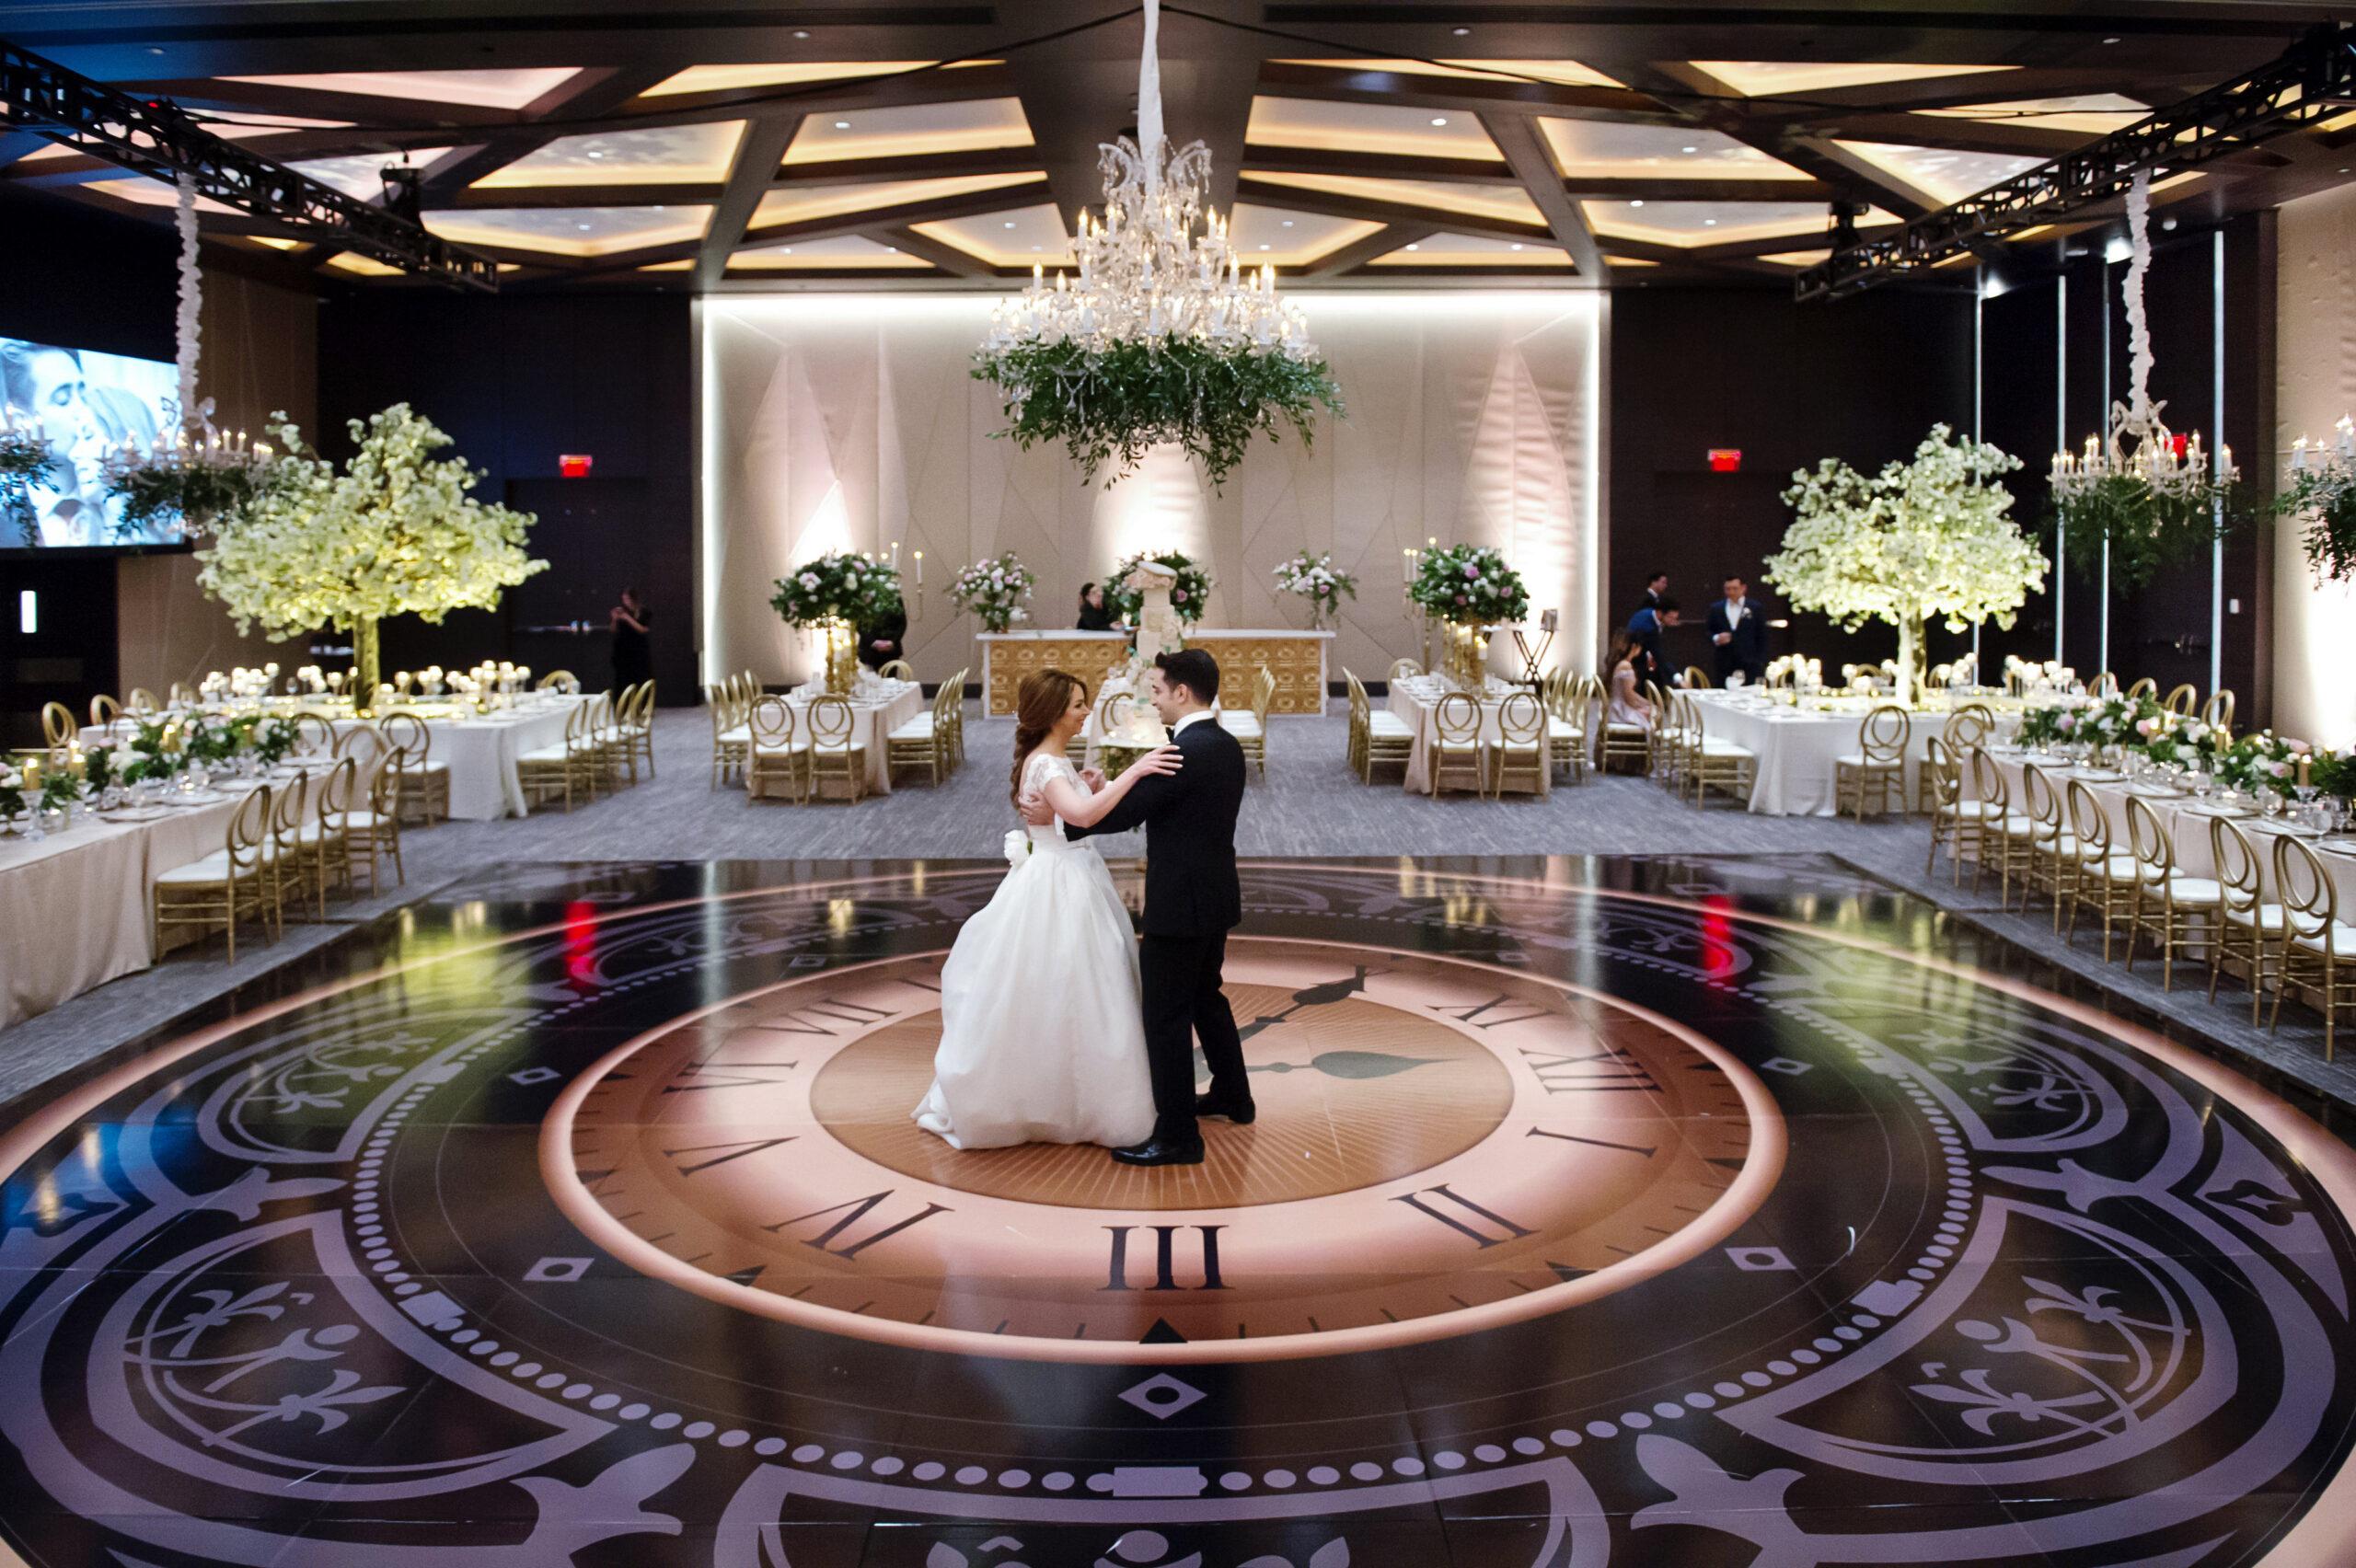 https://secureservercdn.net/45.40.145.151/kgq.ab5.myftpupload.com/wp-content/uploads/2020/04/Sanam-Soroush-s-Wedding-wedluxe-submission-0102-scaled.jpg?time=1606414923